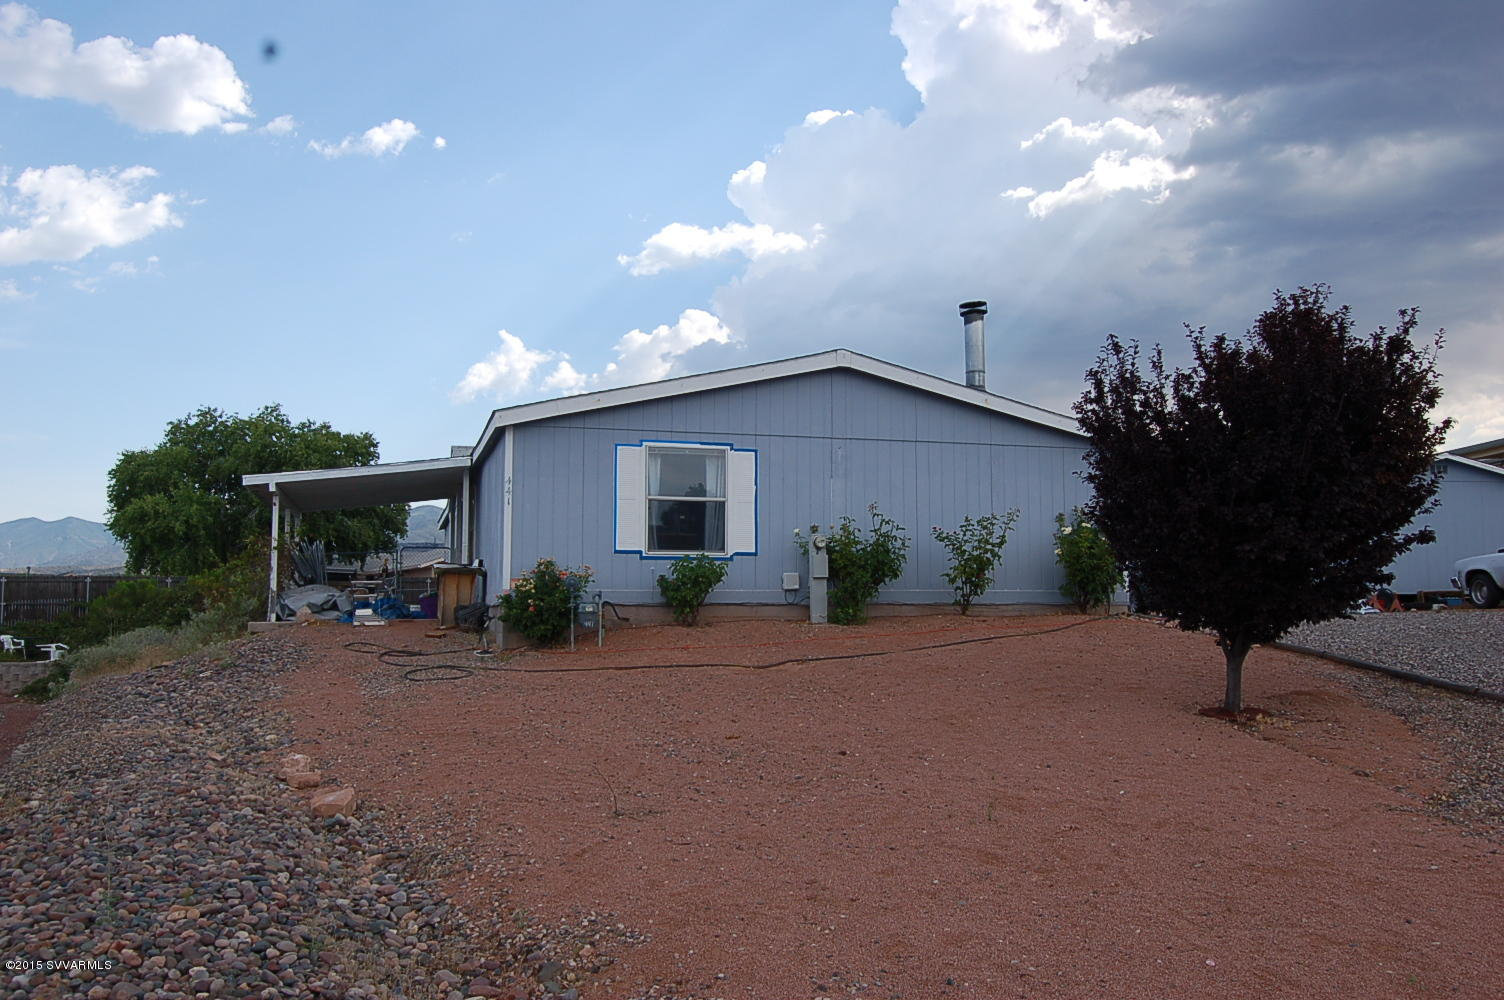 441 Starlight Drive Clarkdale, AZ 86324